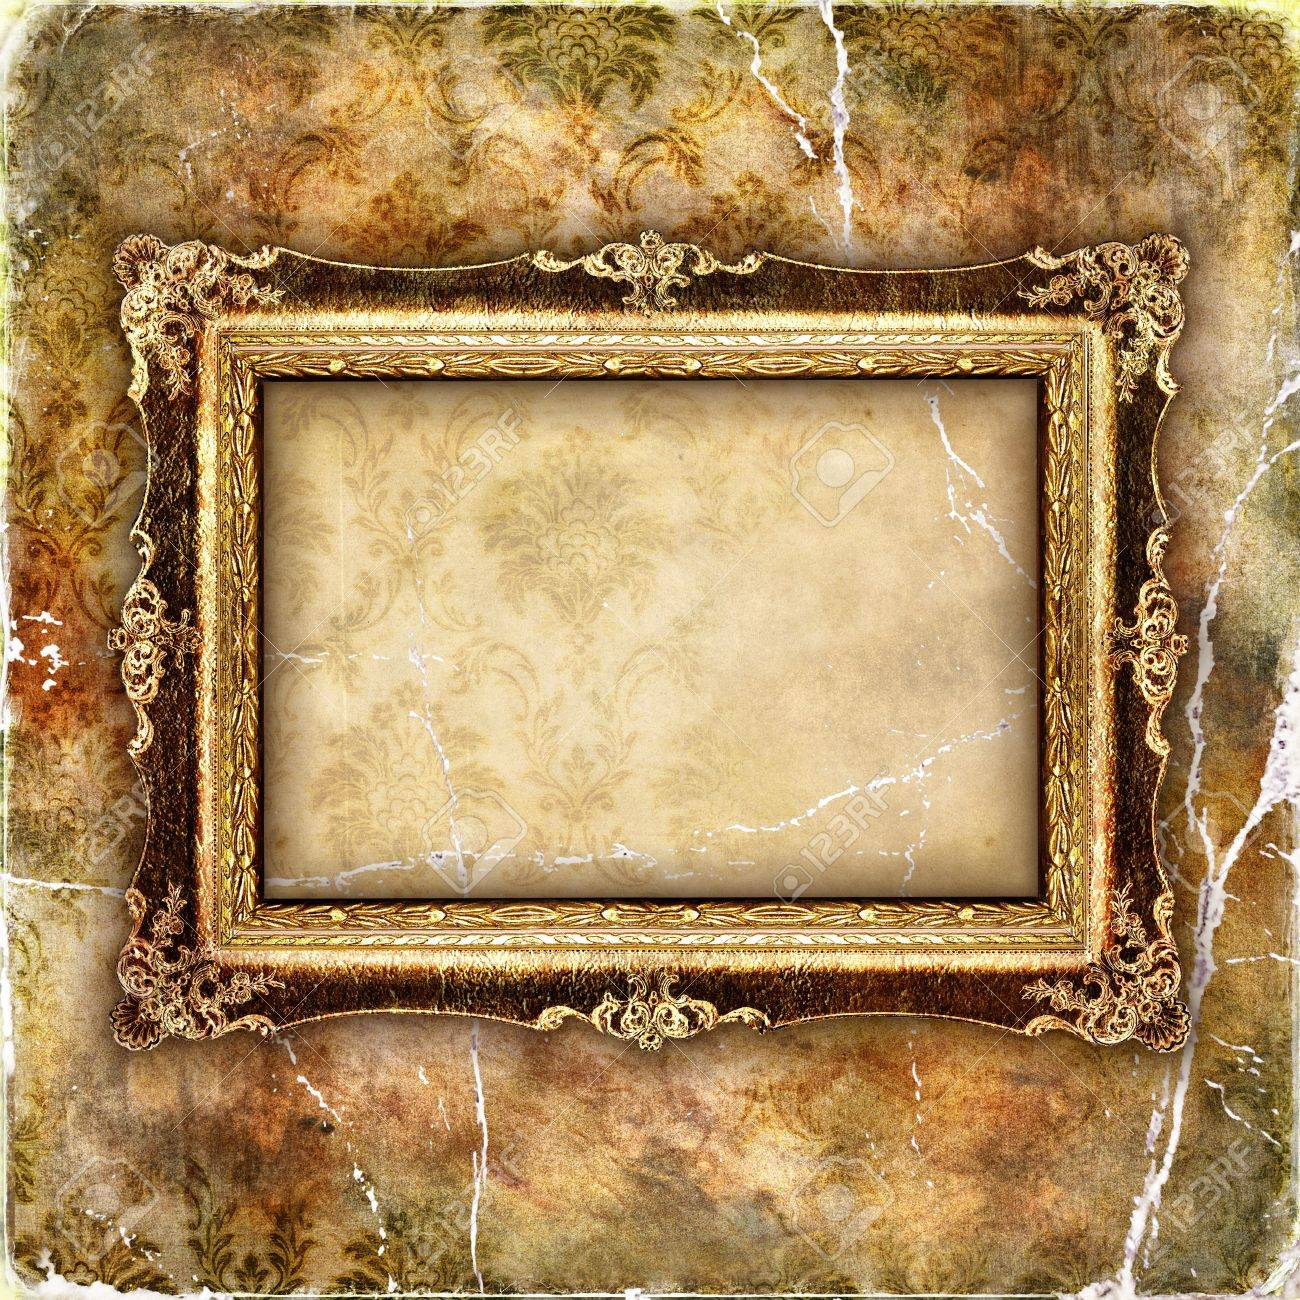 Leeren Rahmen über Alte Hintergrundbild Lizenzfreie Fotos, Bilder ...